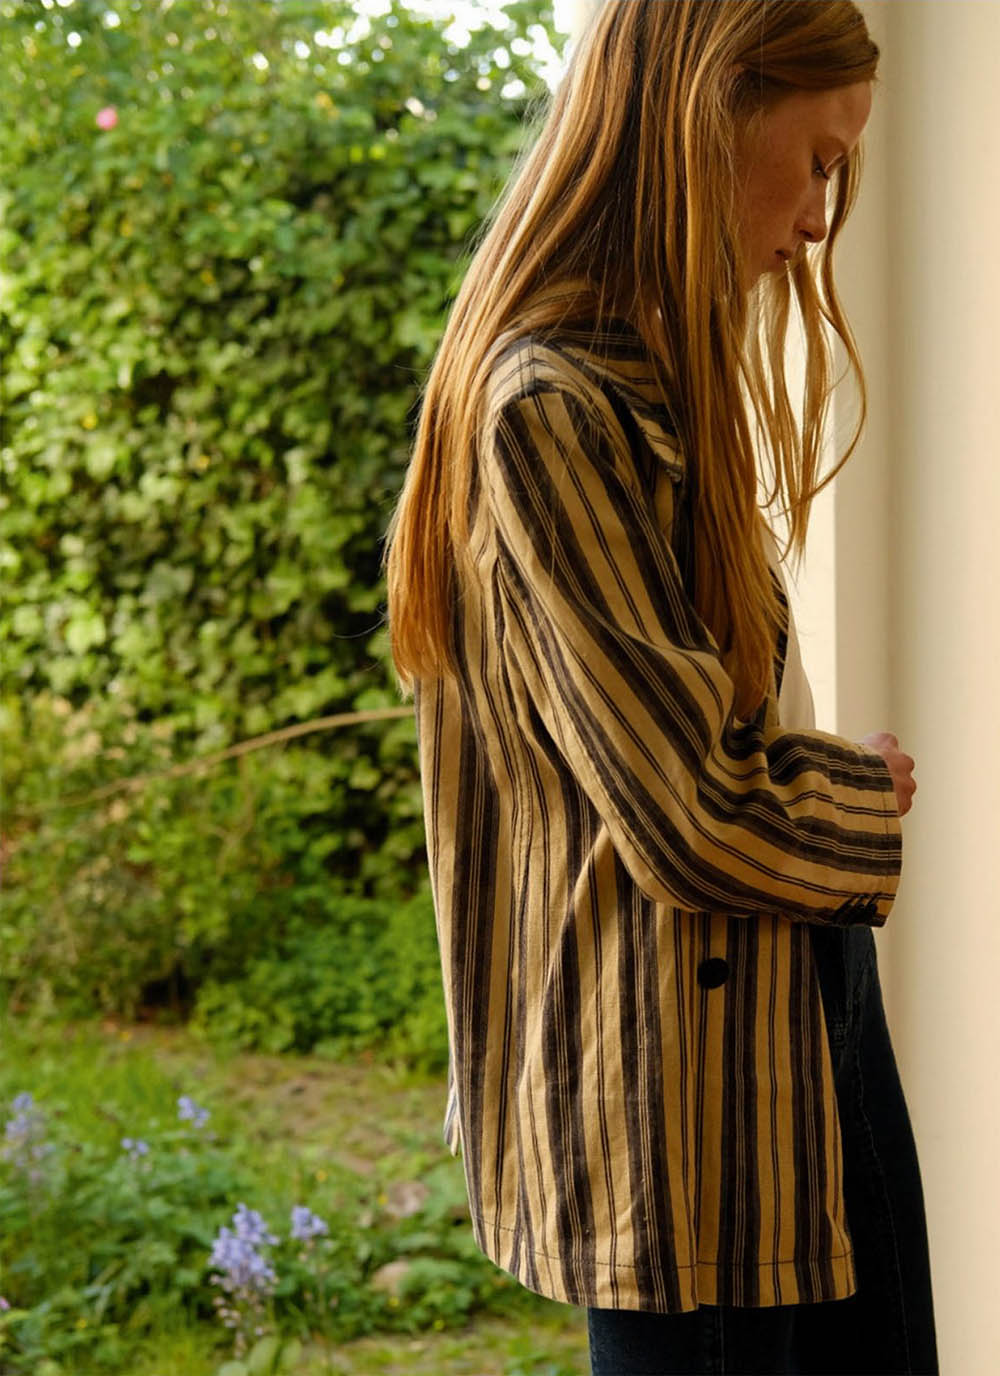 Rianne van Rompaey by Freja Beha Erichsen for Vogue Paris July 2020